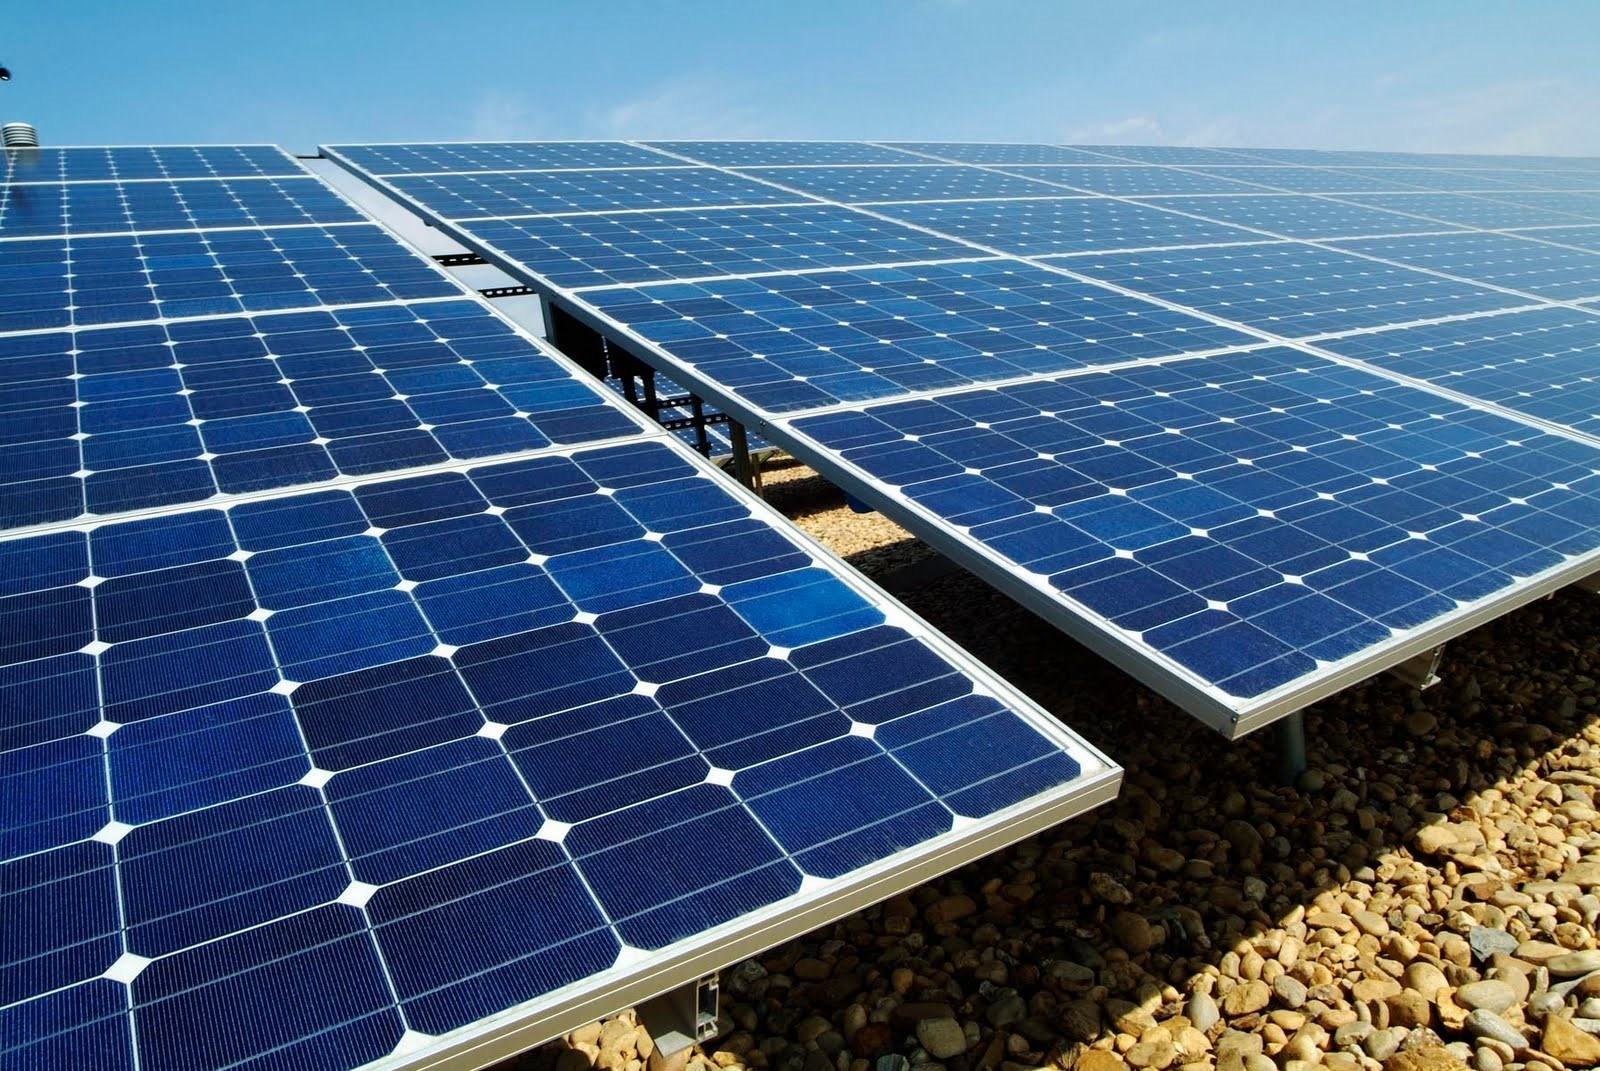 Usina-solar-na-bahia